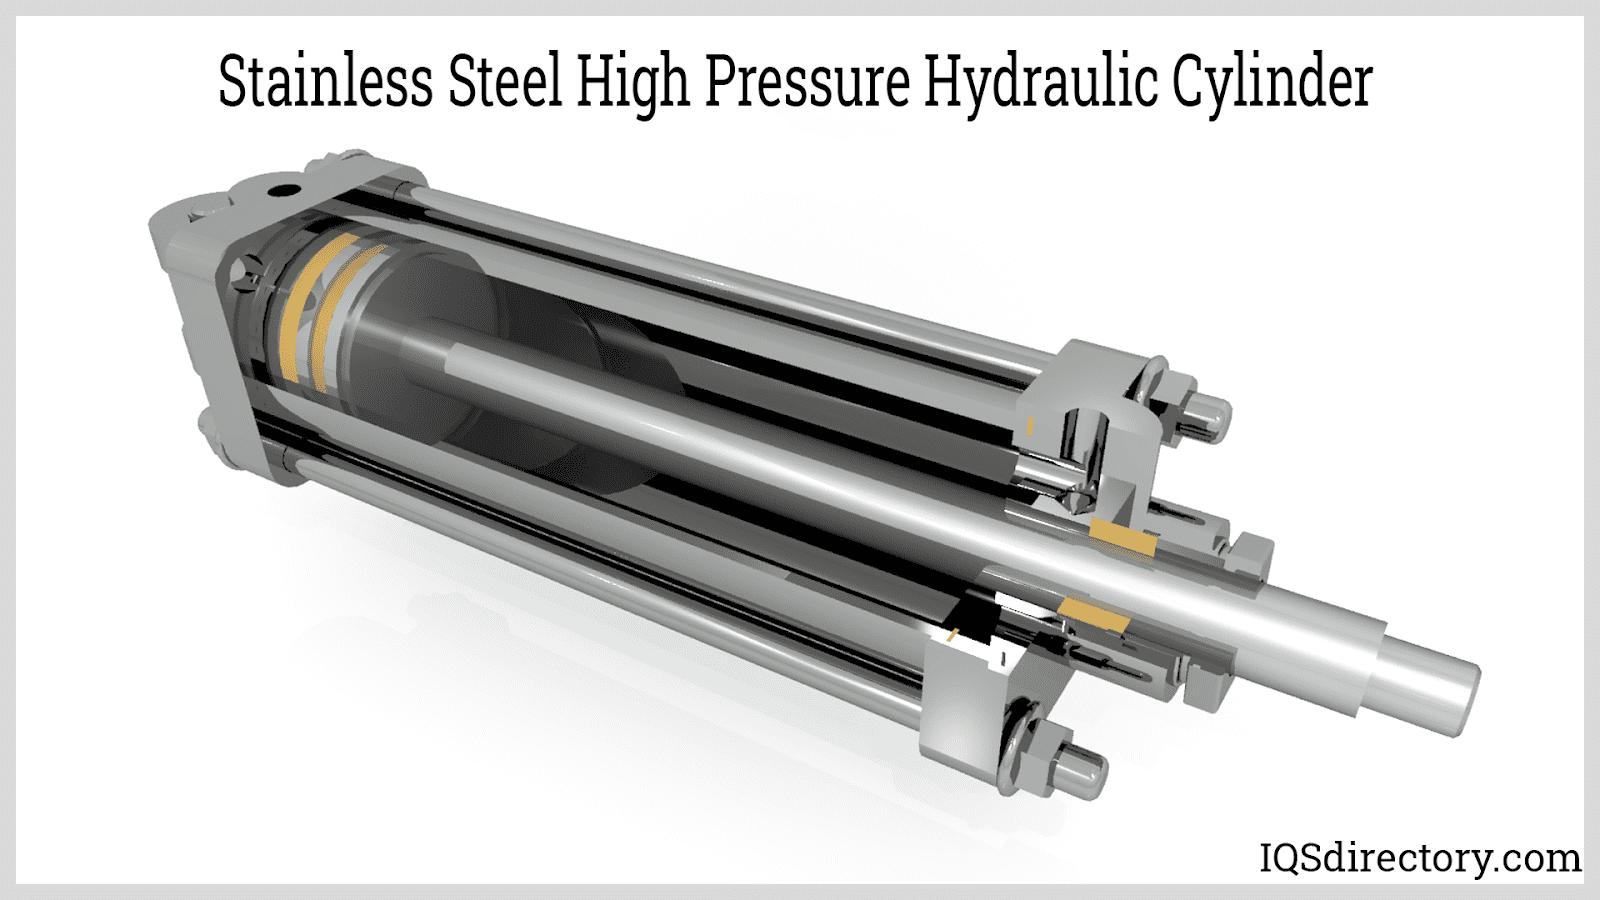 Stainless Steel High Pressure Hydraulic Cylinder